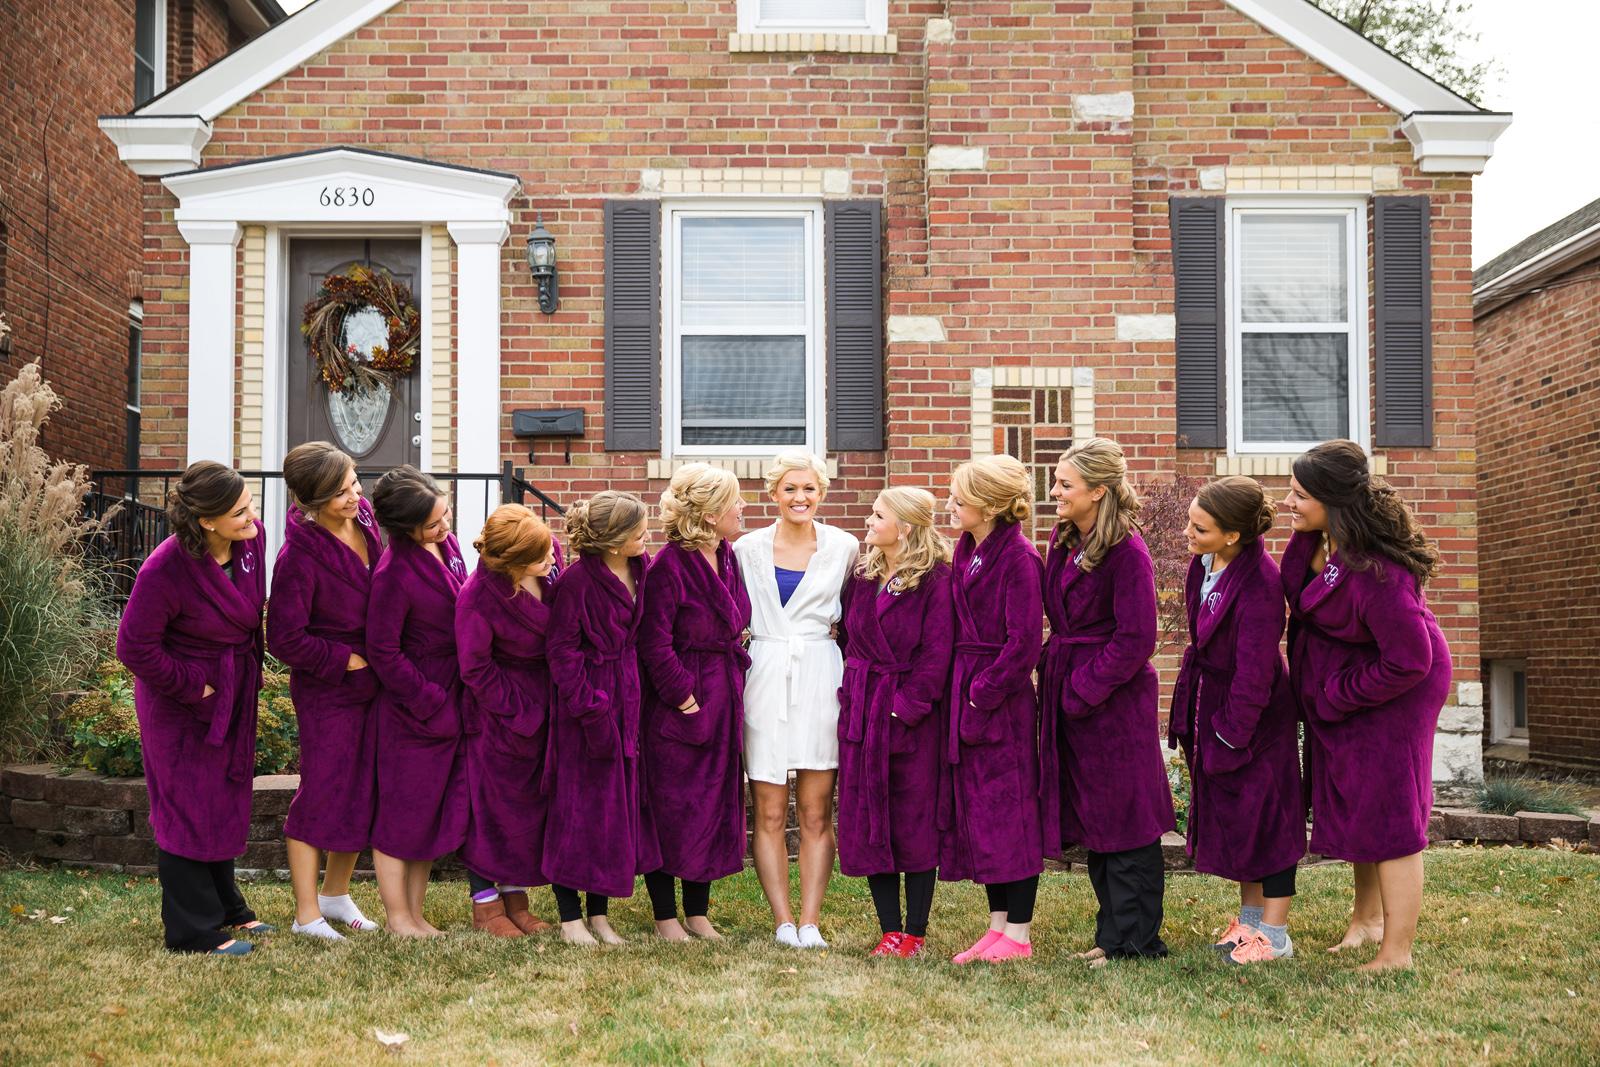 St Louis Winter Wedding Photography_20141115_13203311.jpg